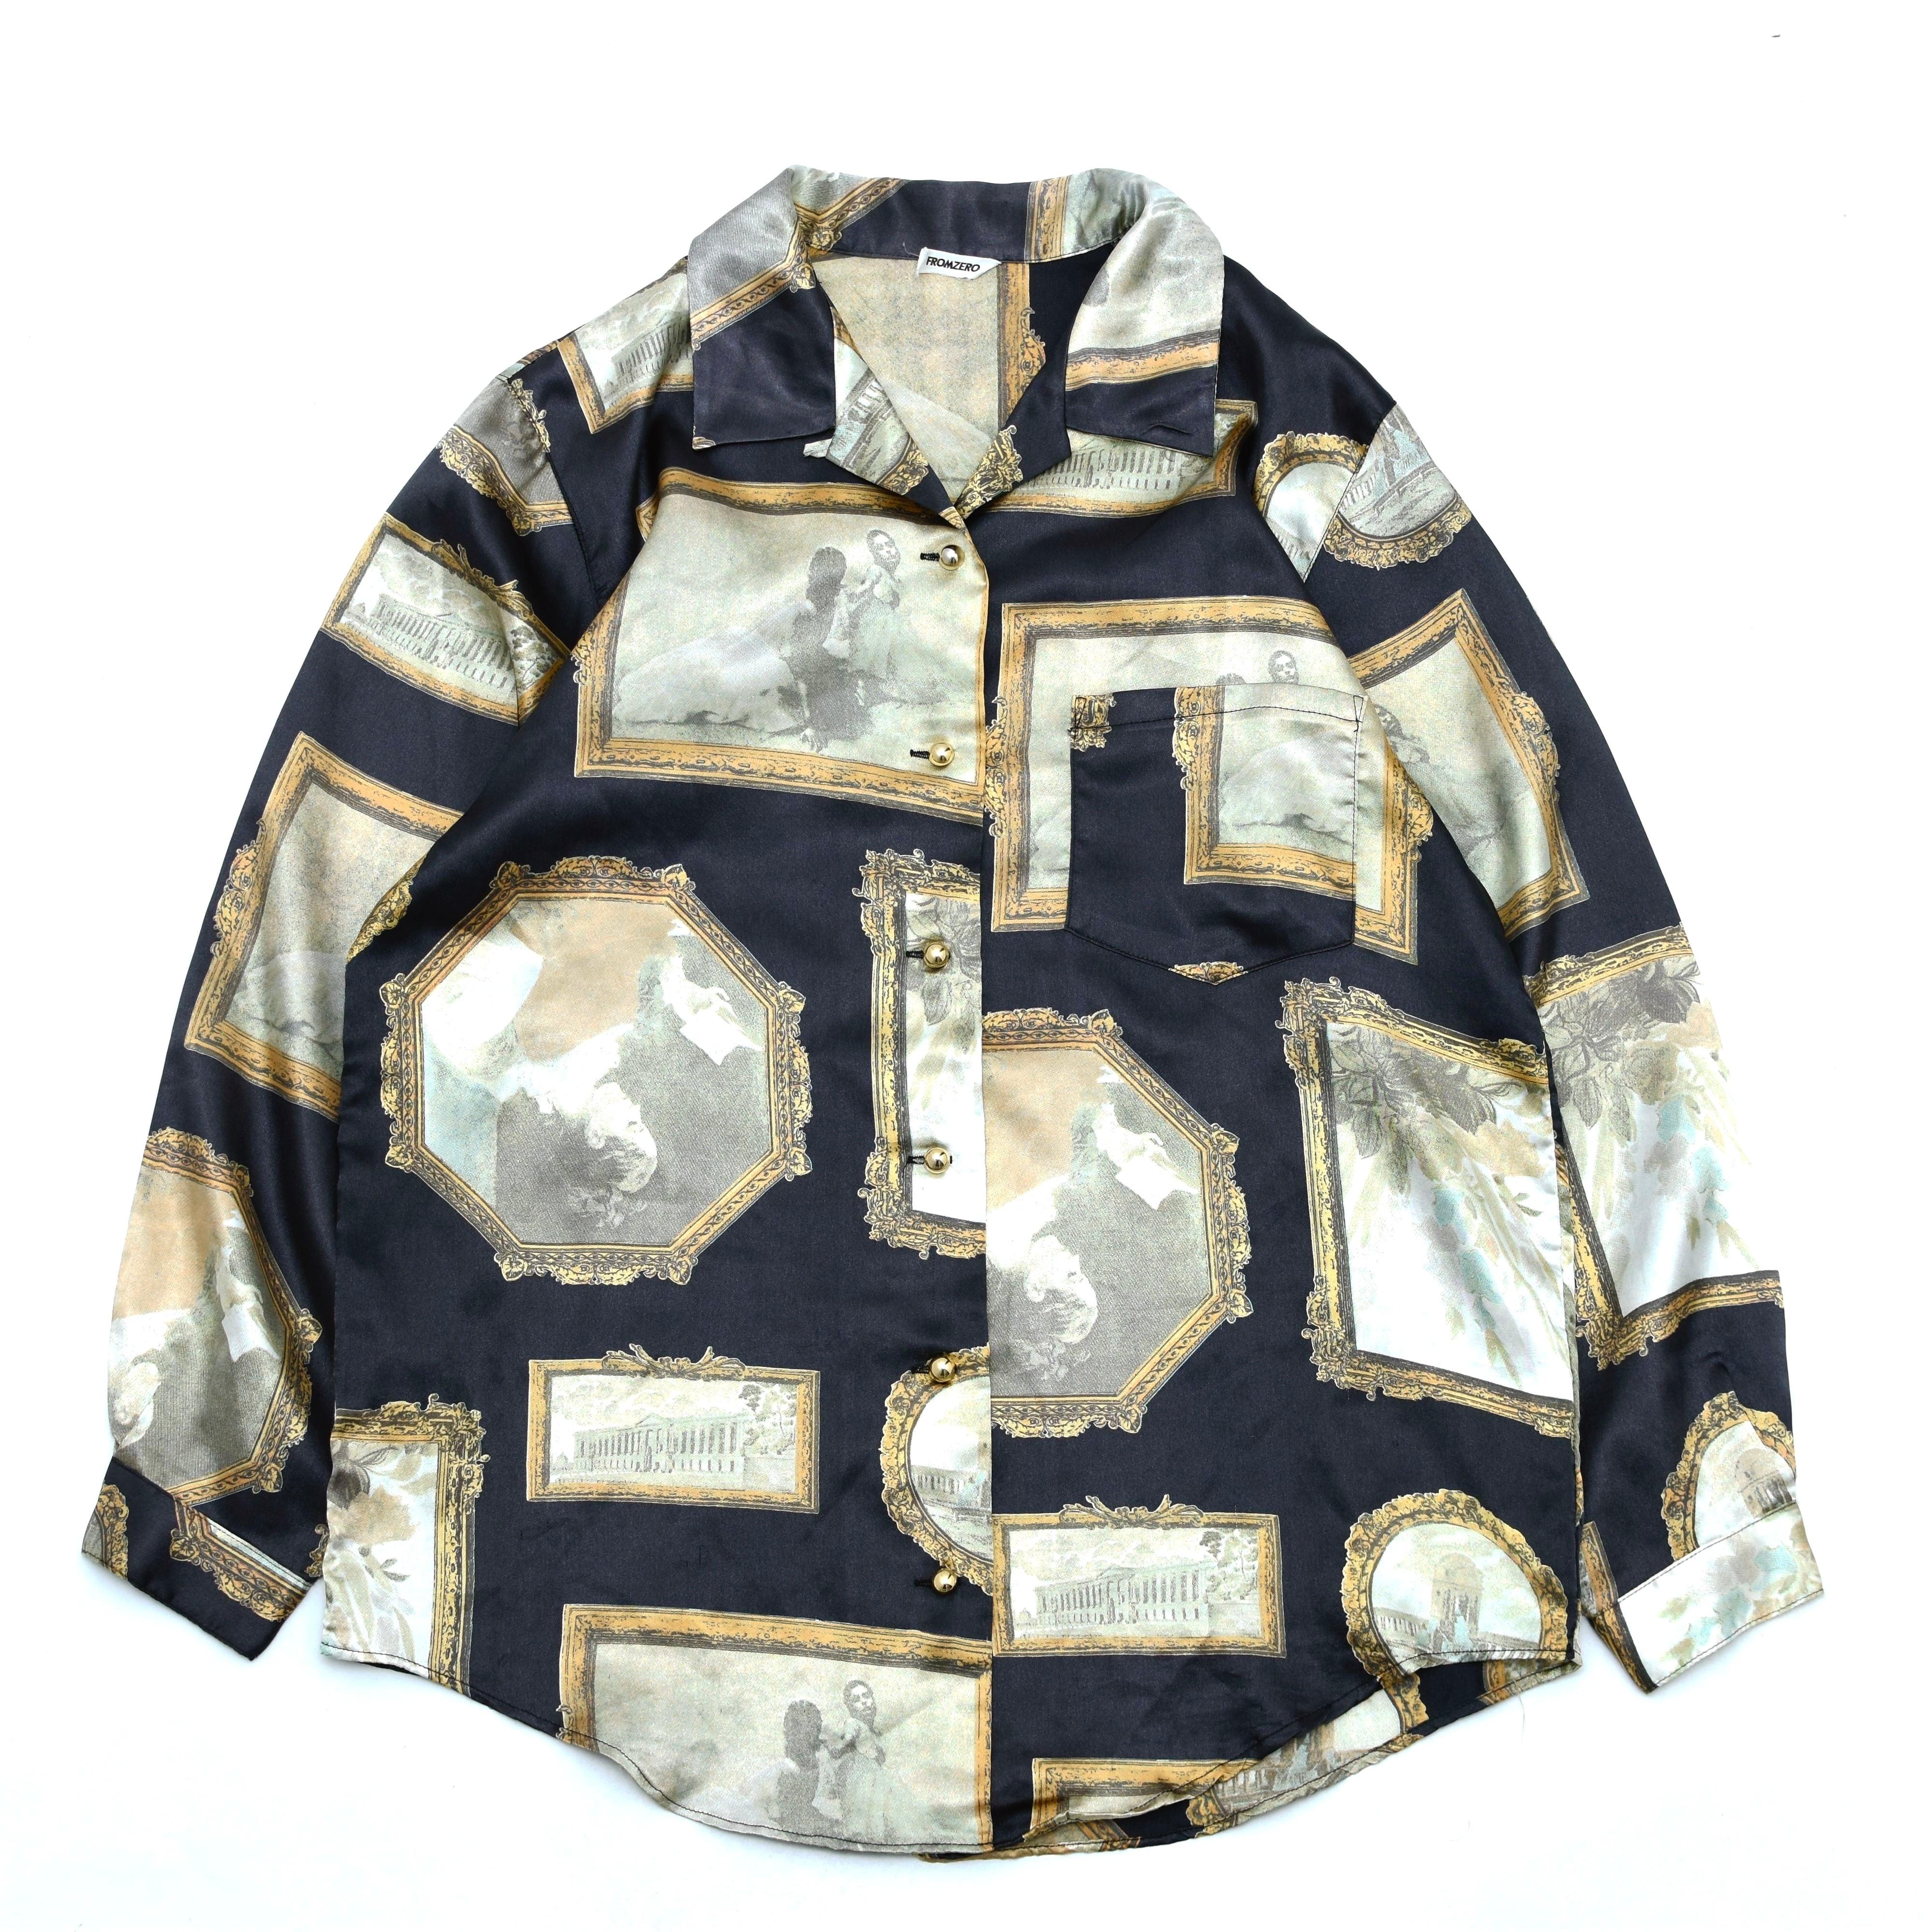 VTG art print pattern polyester shirt